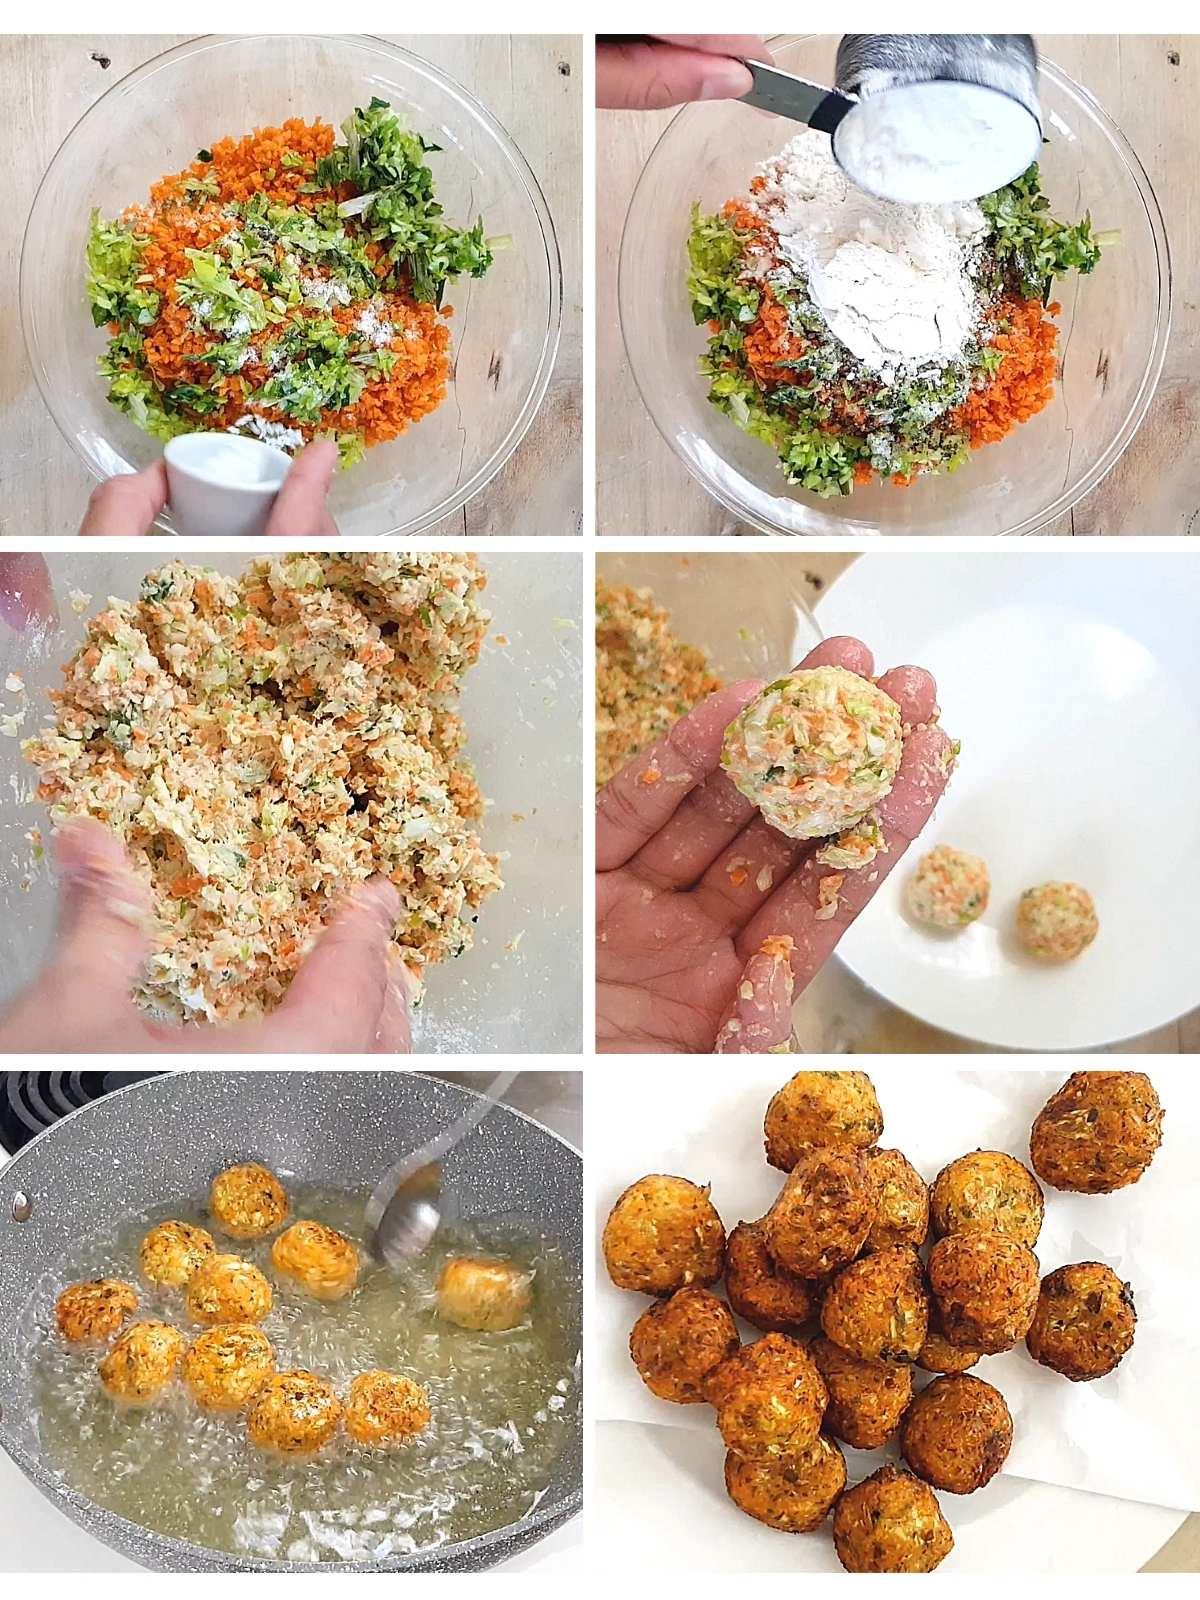 process shots of how to make Manchurian balls.